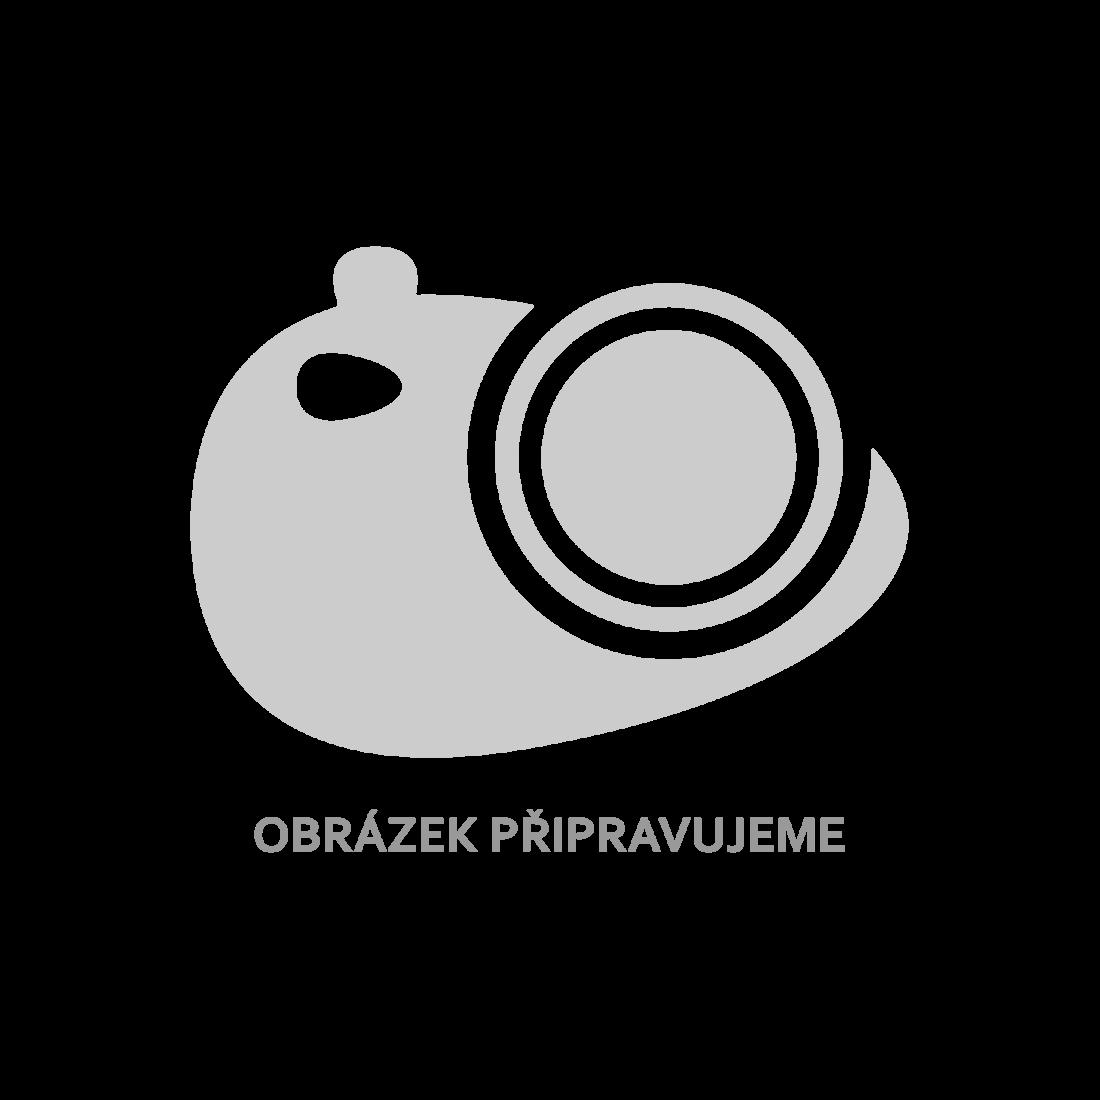 Skládací venkovní barové židle 2 ks z akáciového dřeva [42656]